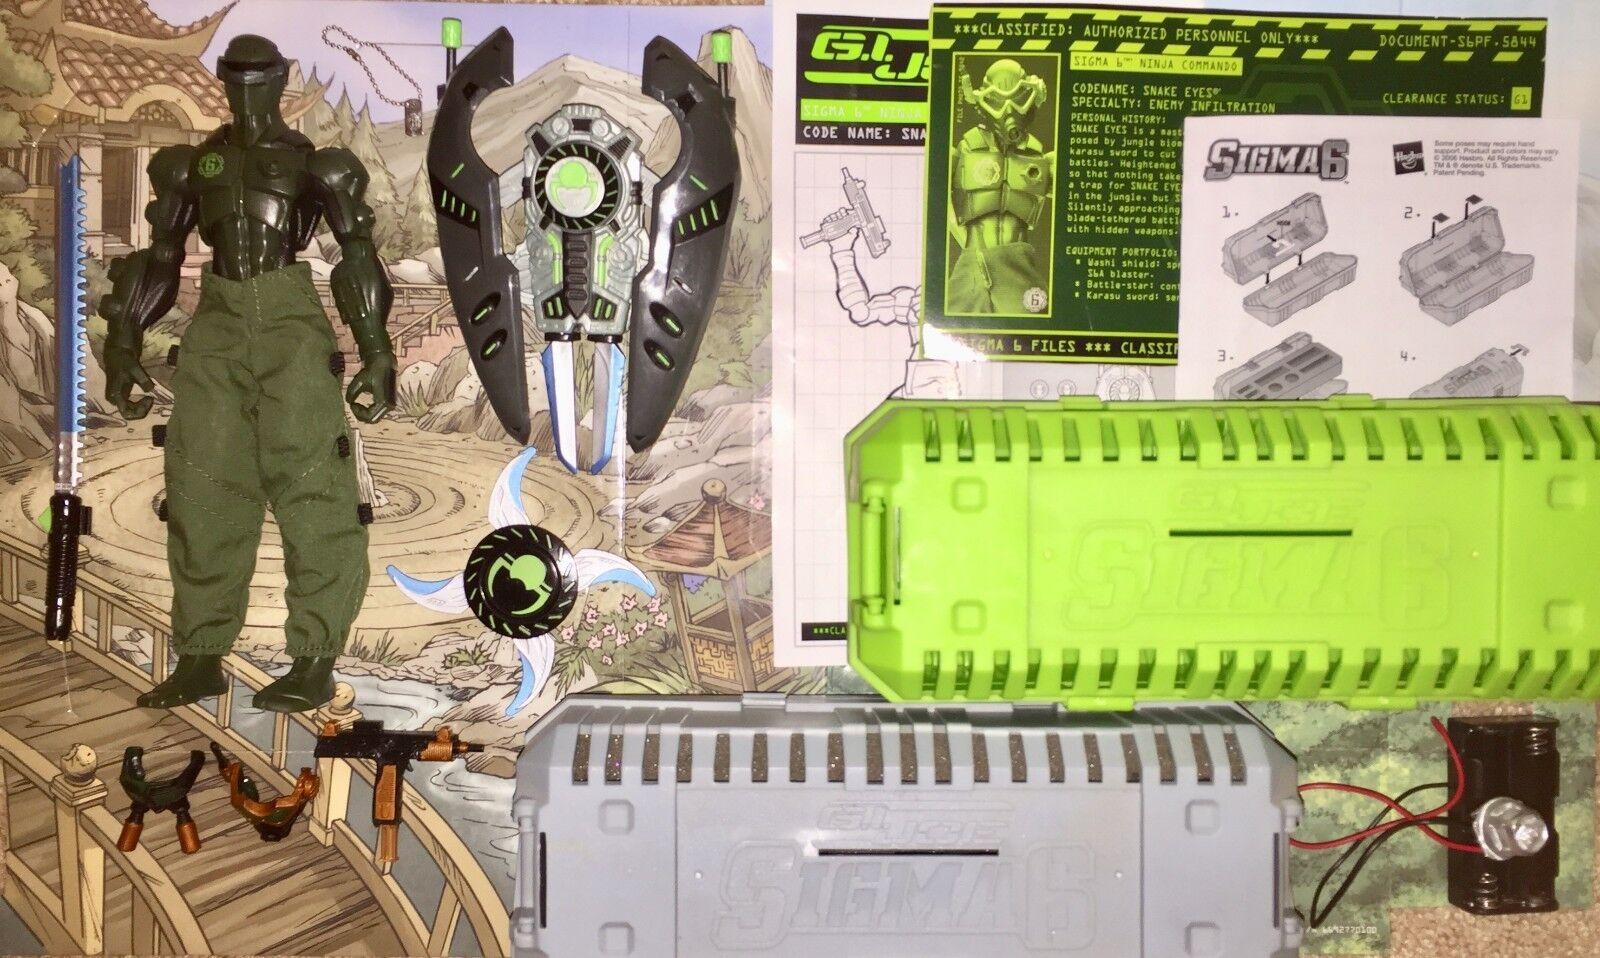 2006 Sigma 6 Snake Eyes v5 GI Joe Jungle Commando 100% with BOTH VARIANT CRATES